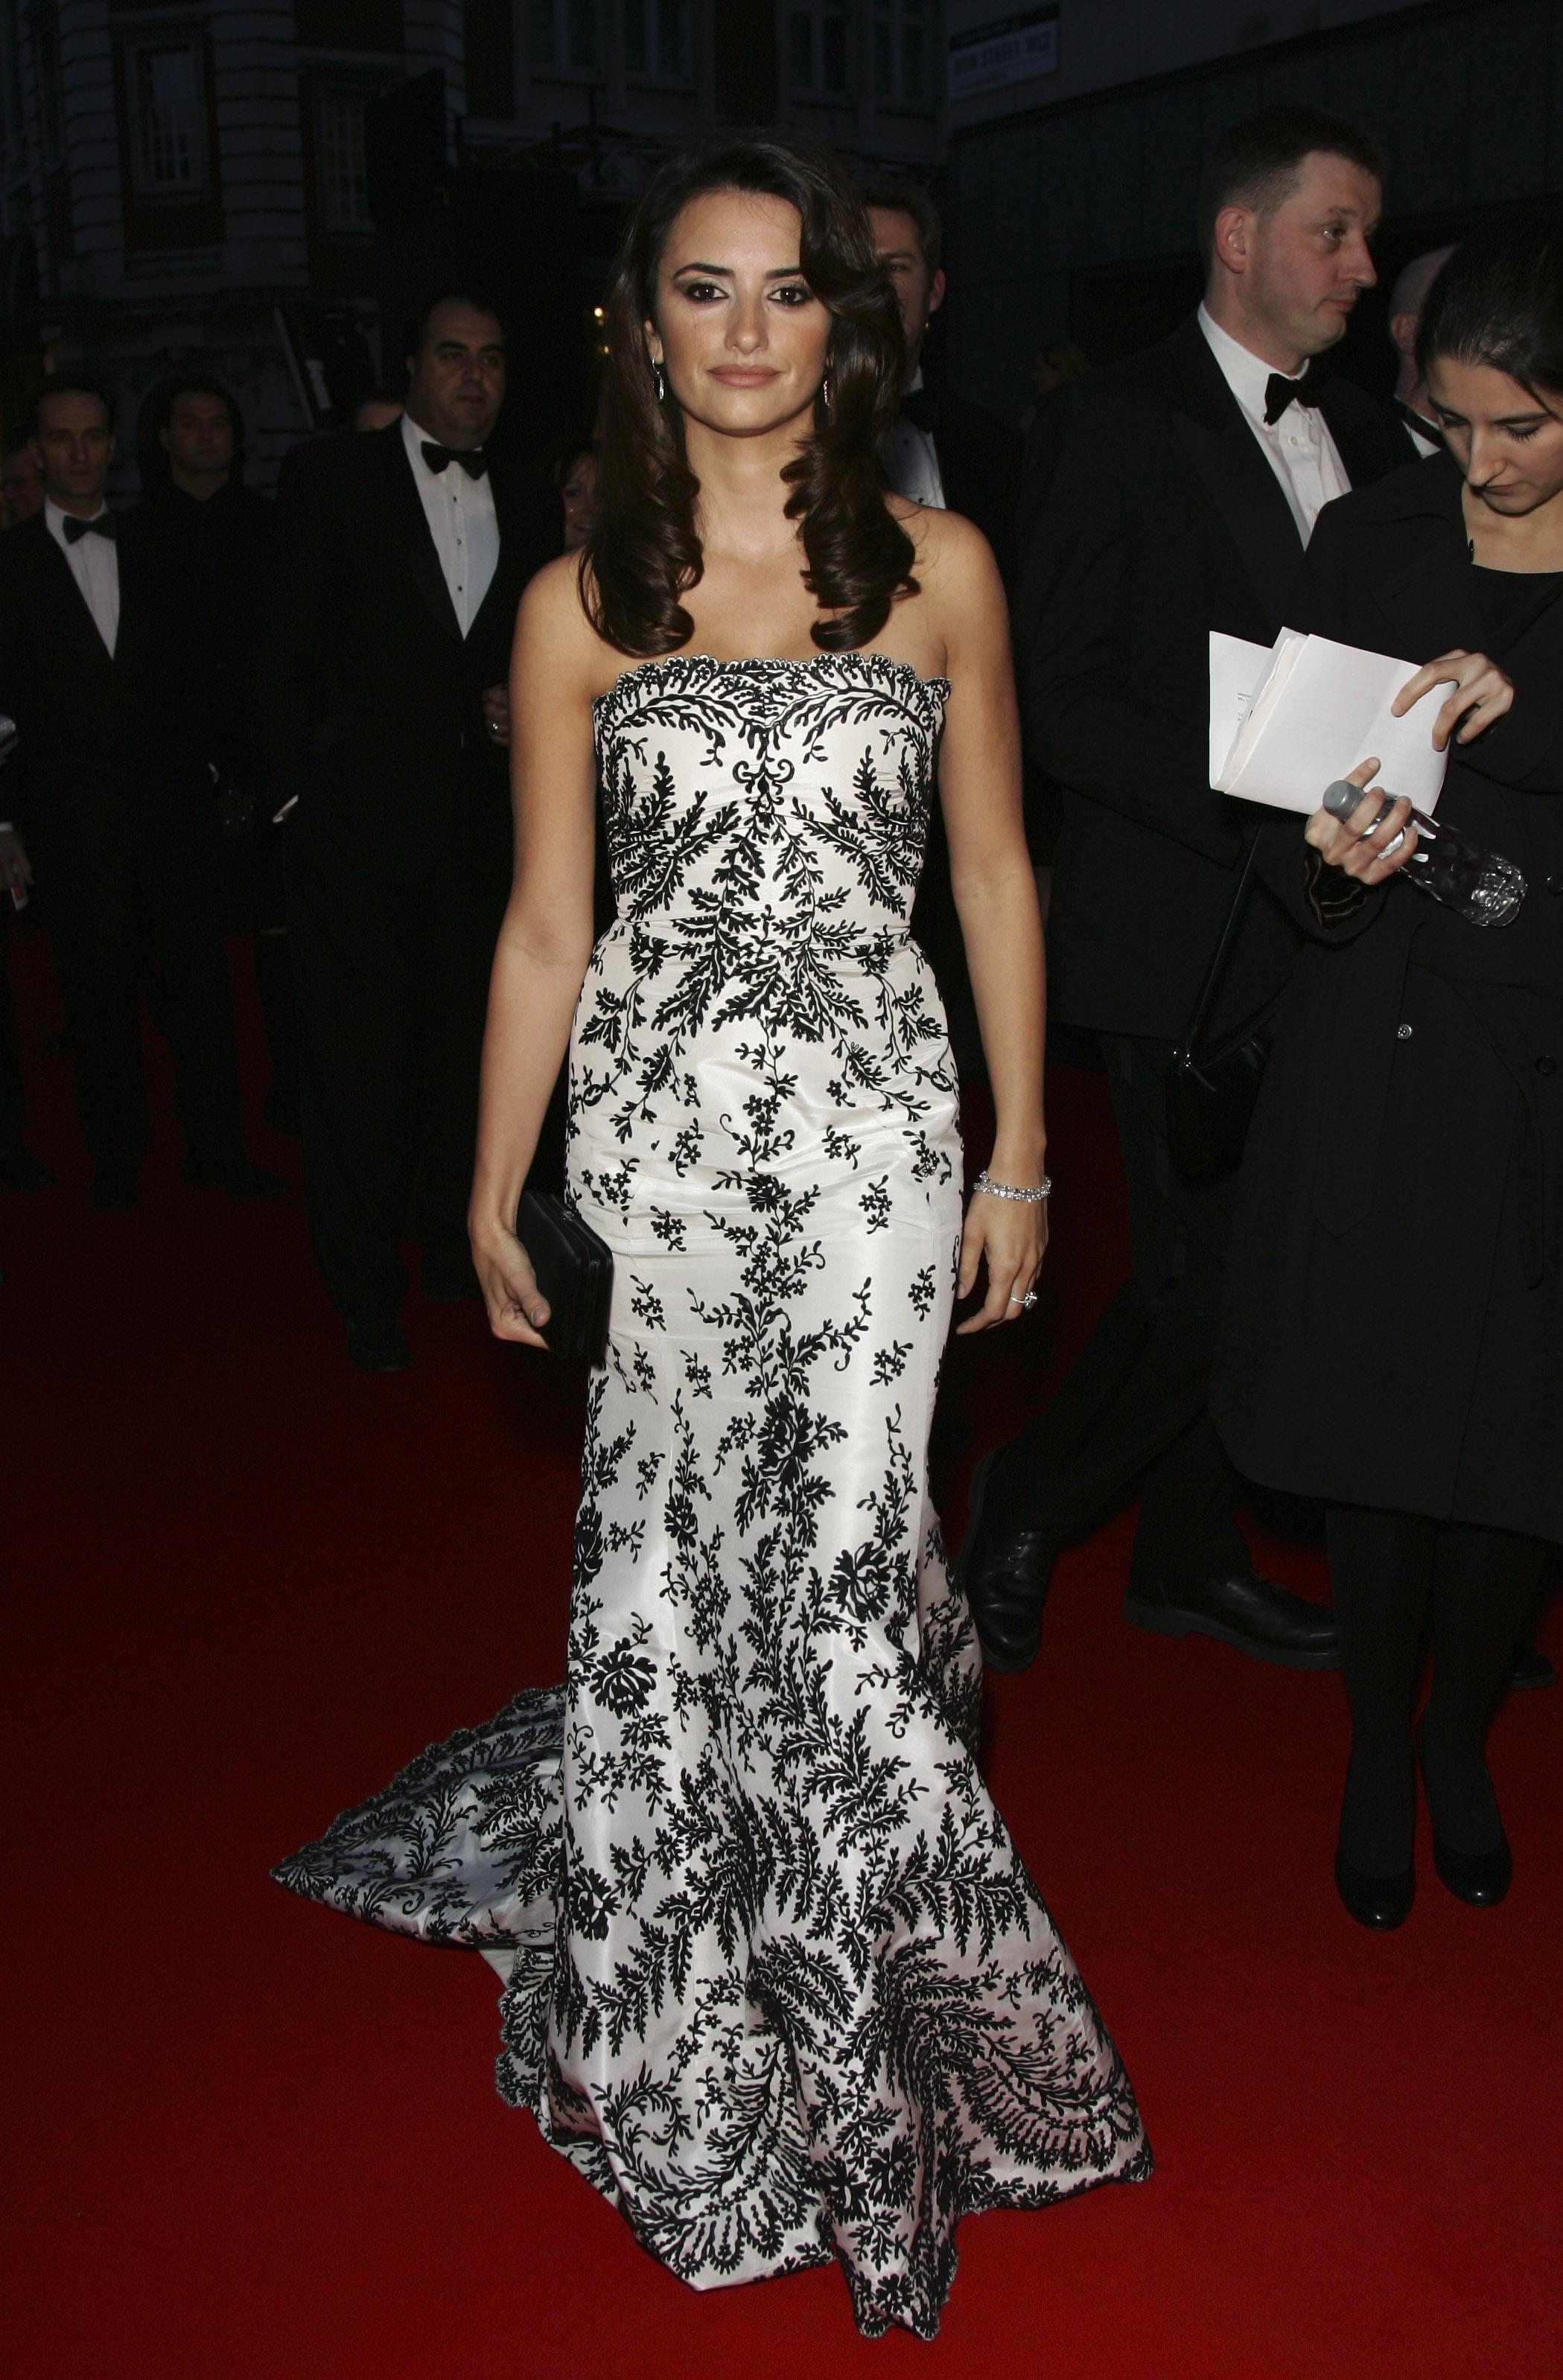 BAFTAs Best Dressed: Oι 20 καλύτερες εμφανίσεις όλων των εποχών